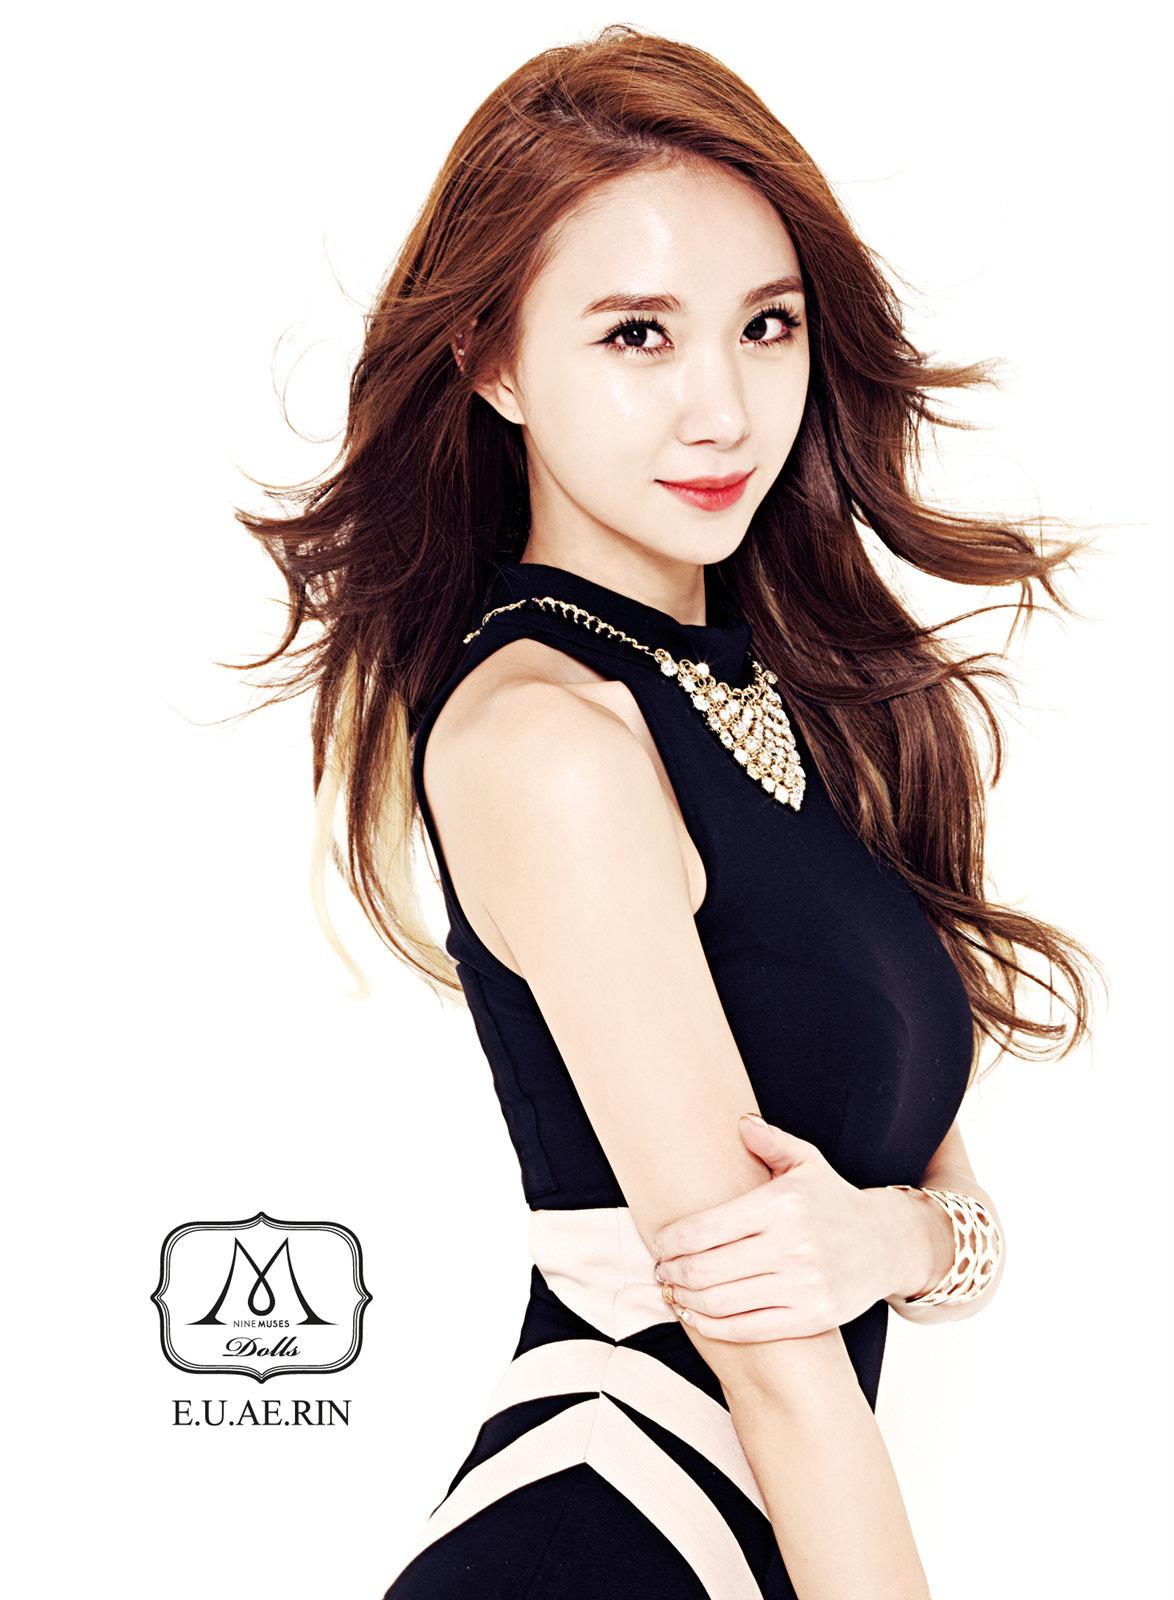 AoA: Φωτογράφιση στο GQ Korea | I say myeolchi // k-pop in